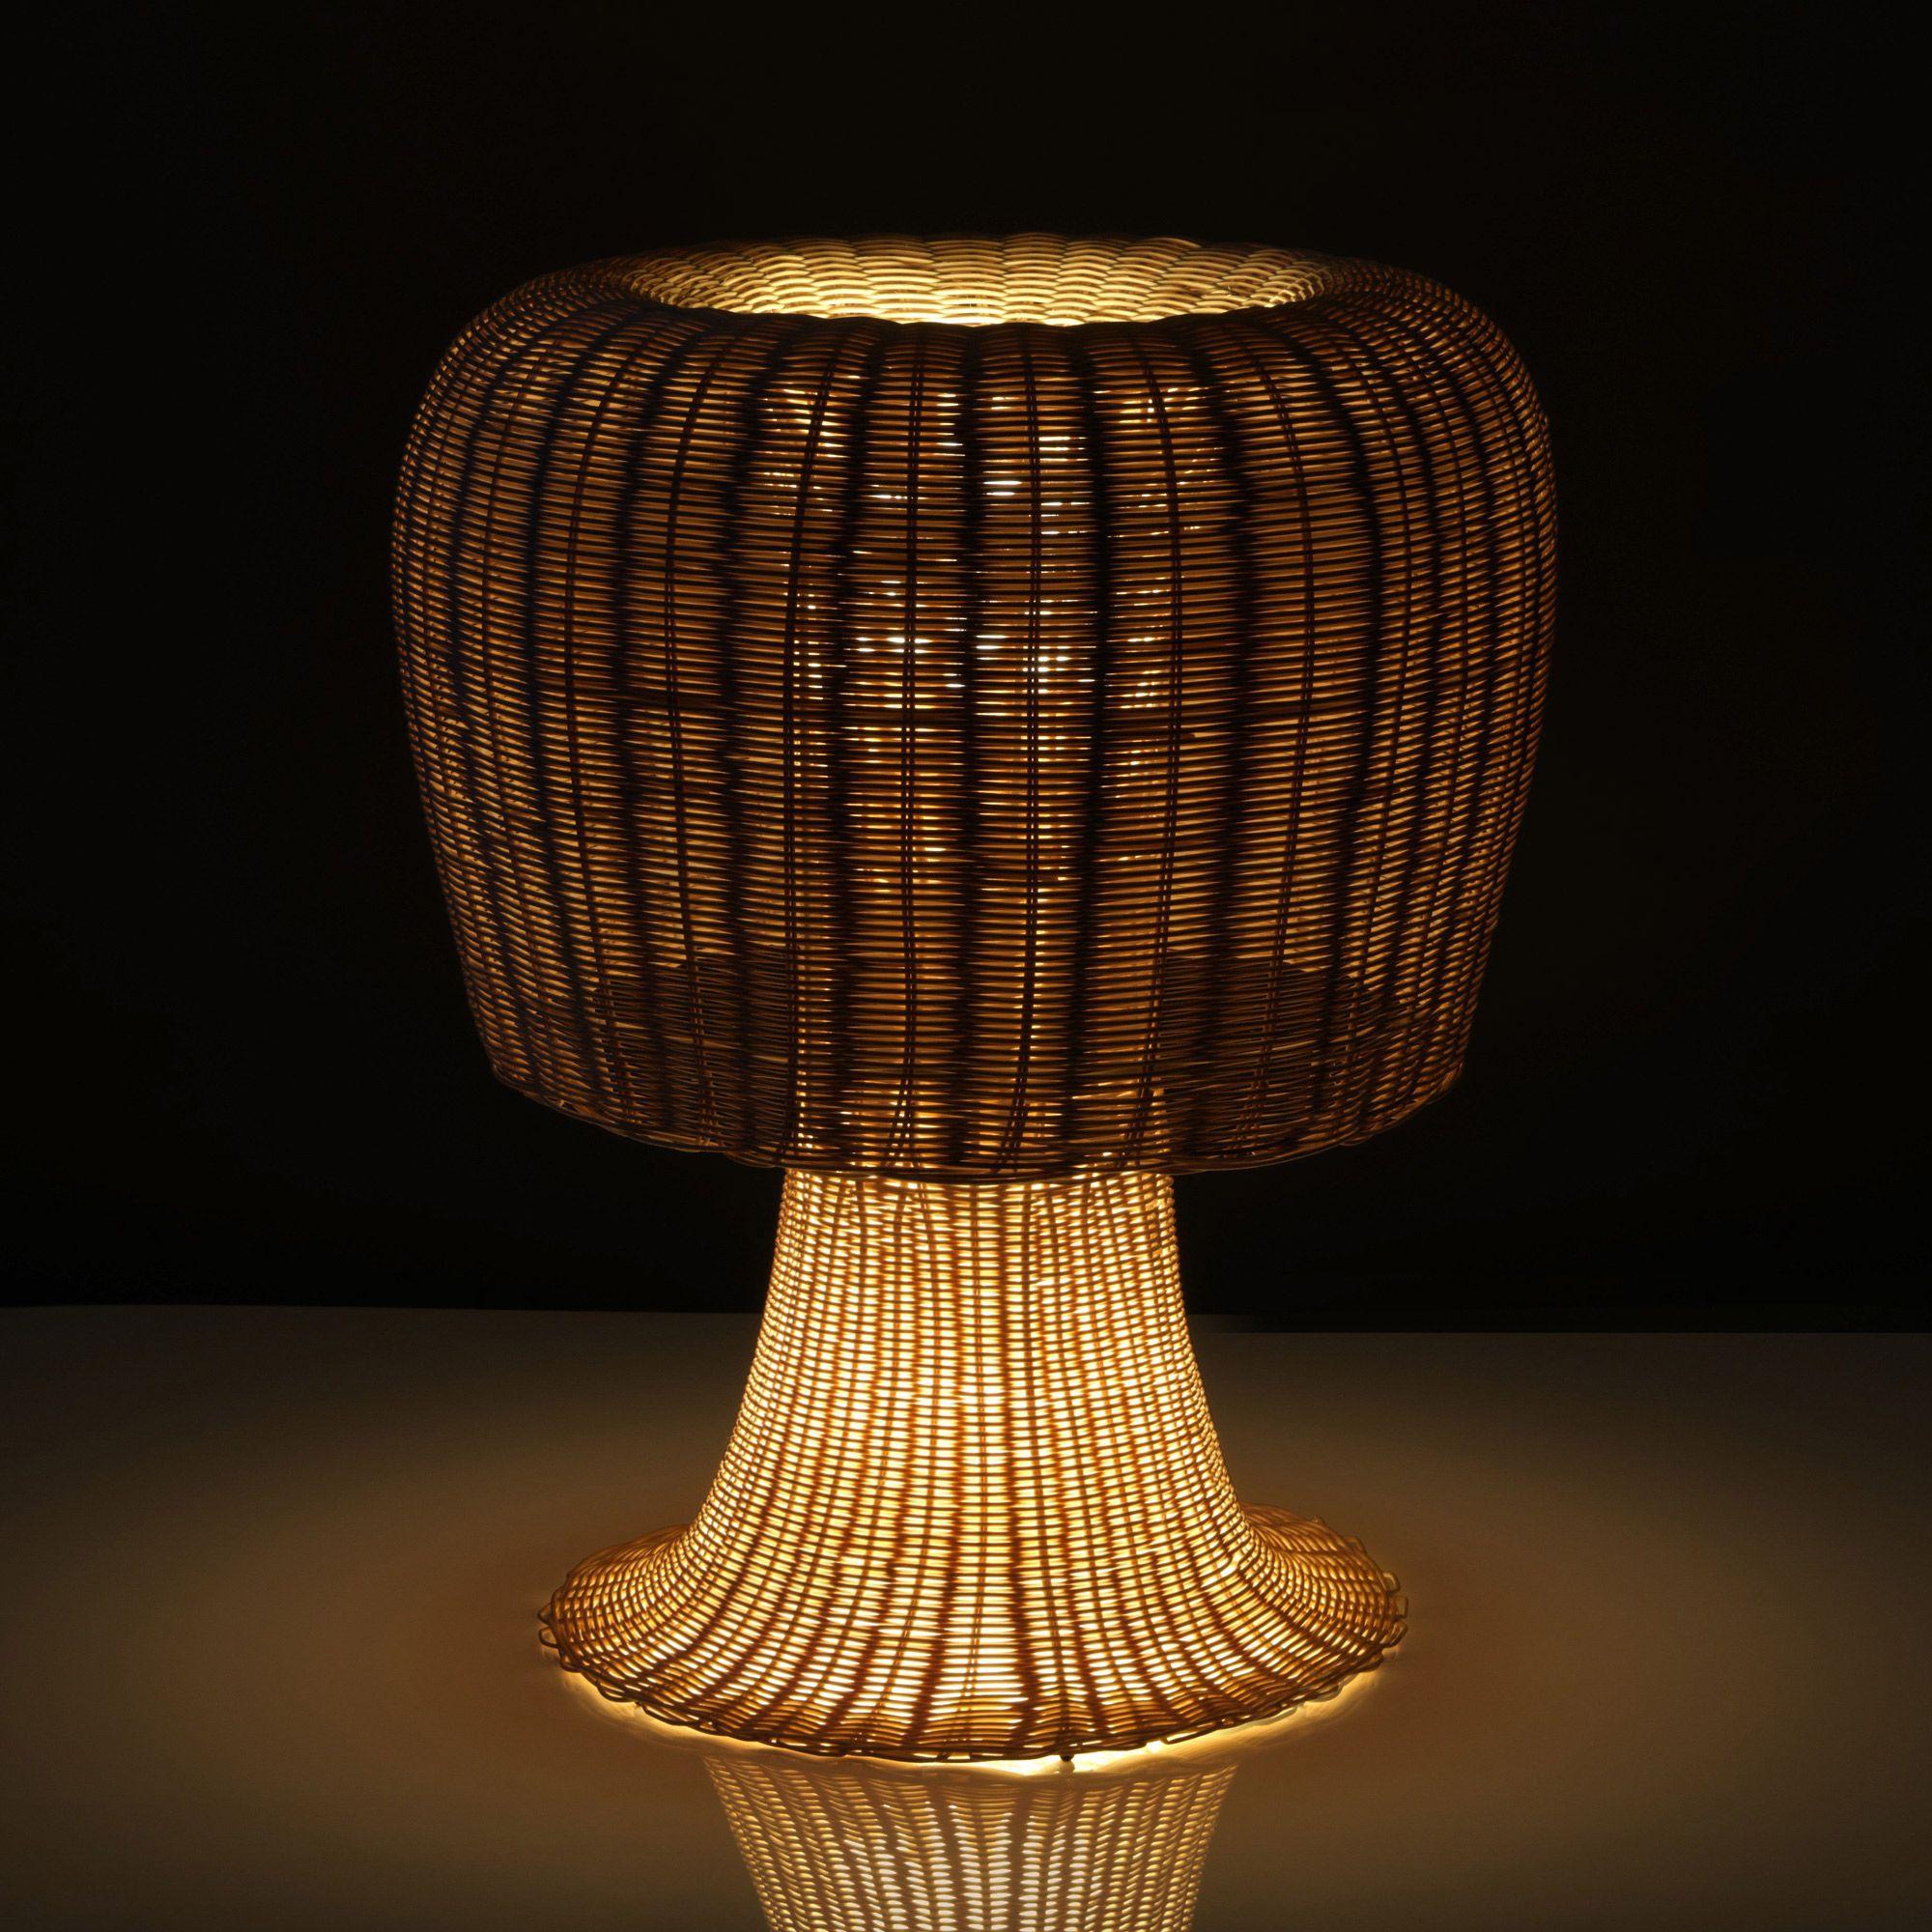 lampe poser rotin h60cm amanita rotin chantier et lampes. Black Bedroom Furniture Sets. Home Design Ideas